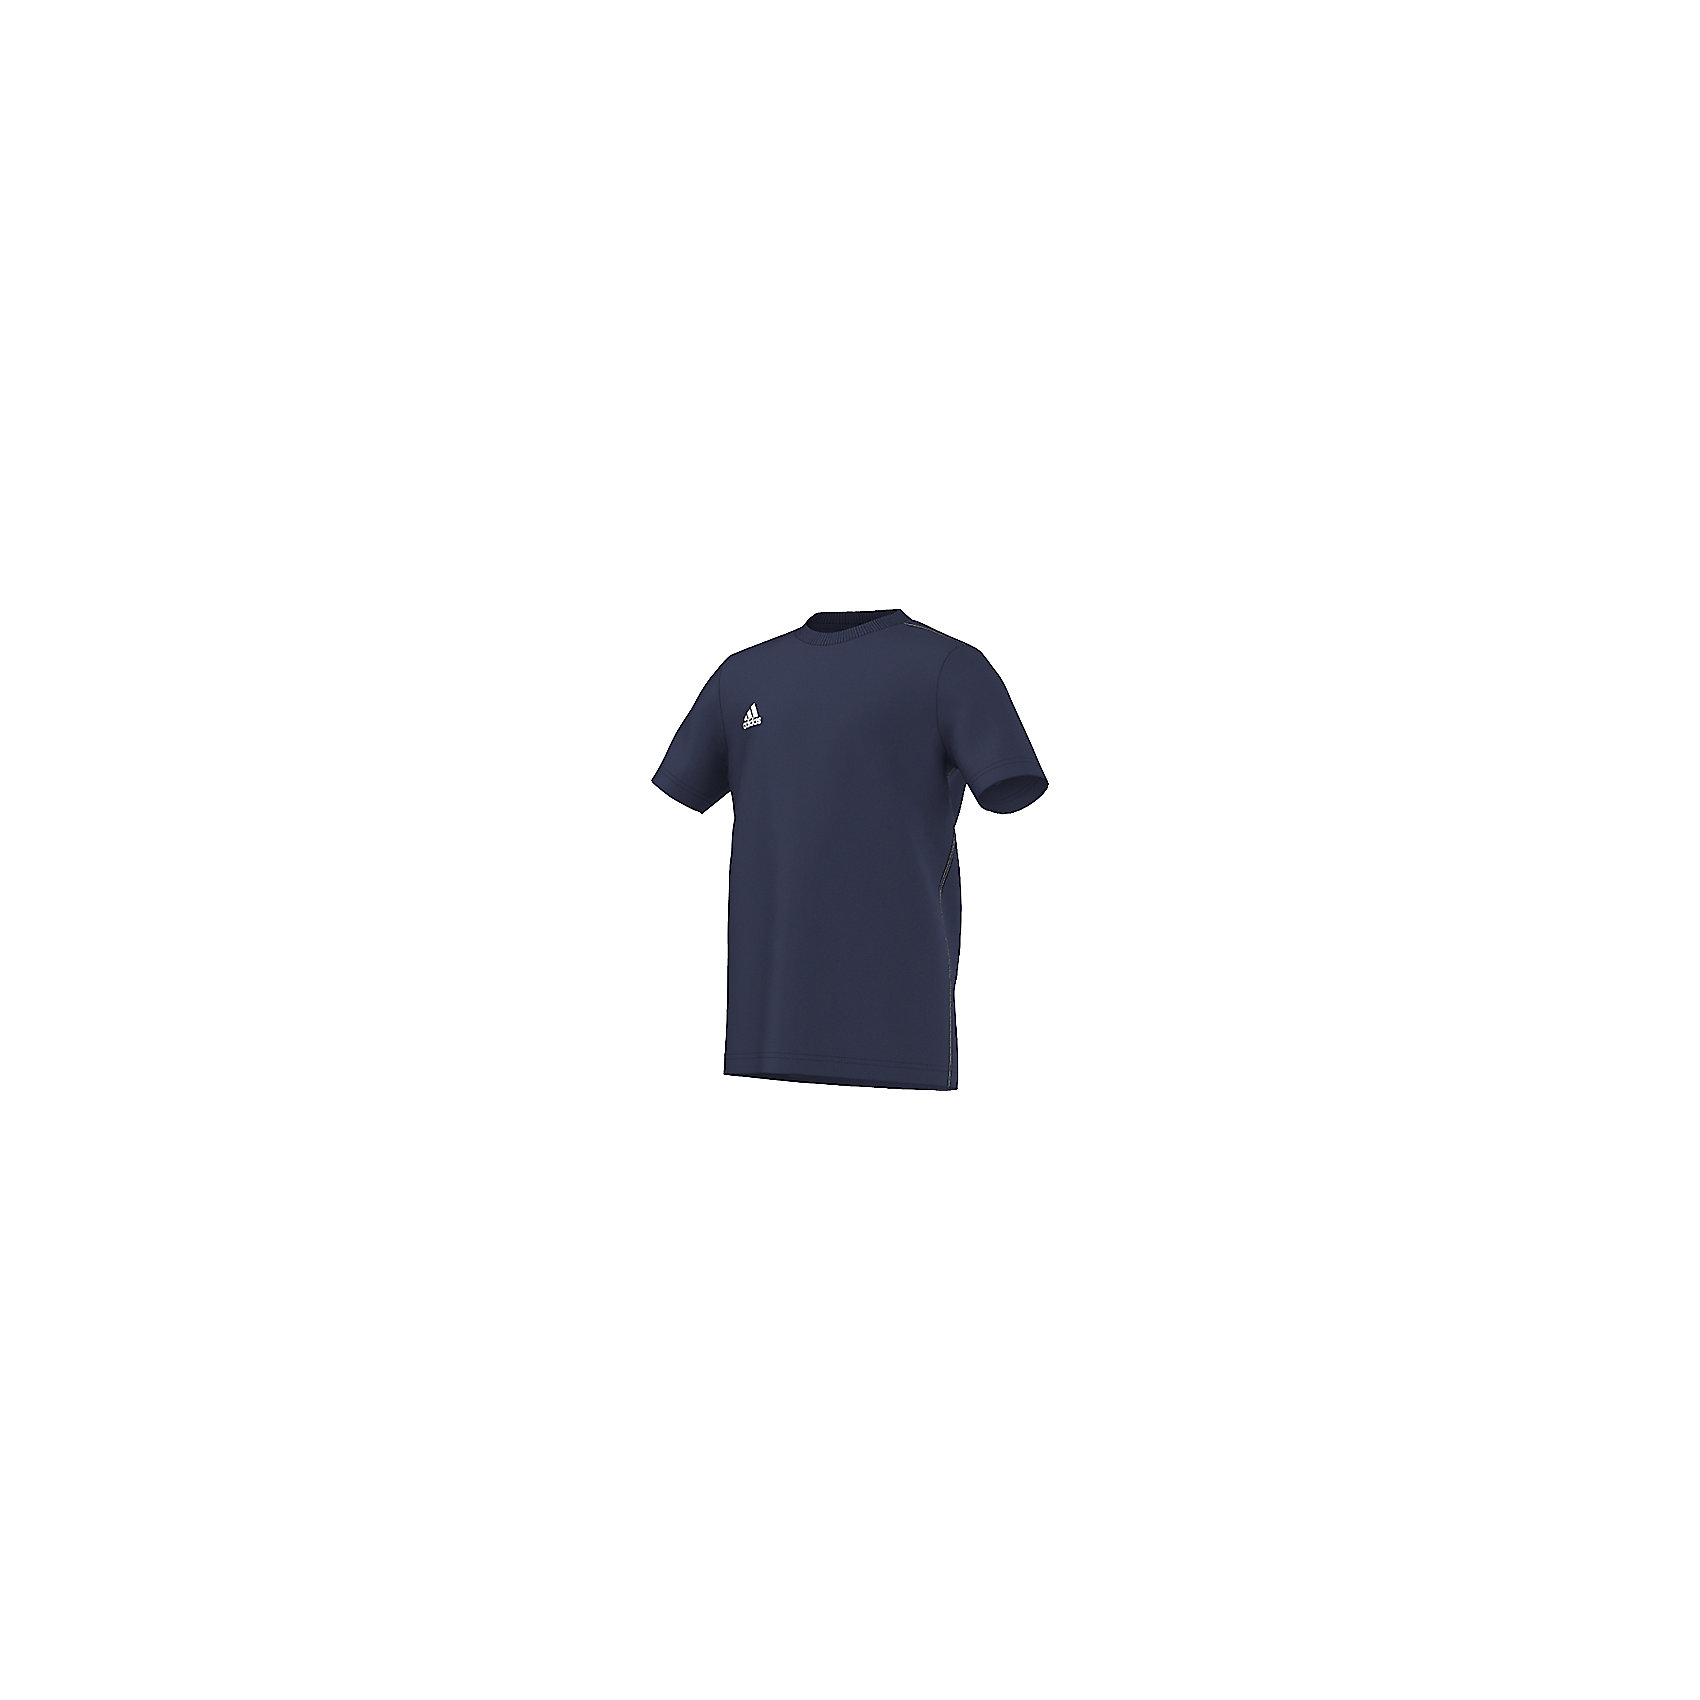 Футболка Core 15 Tee adidas